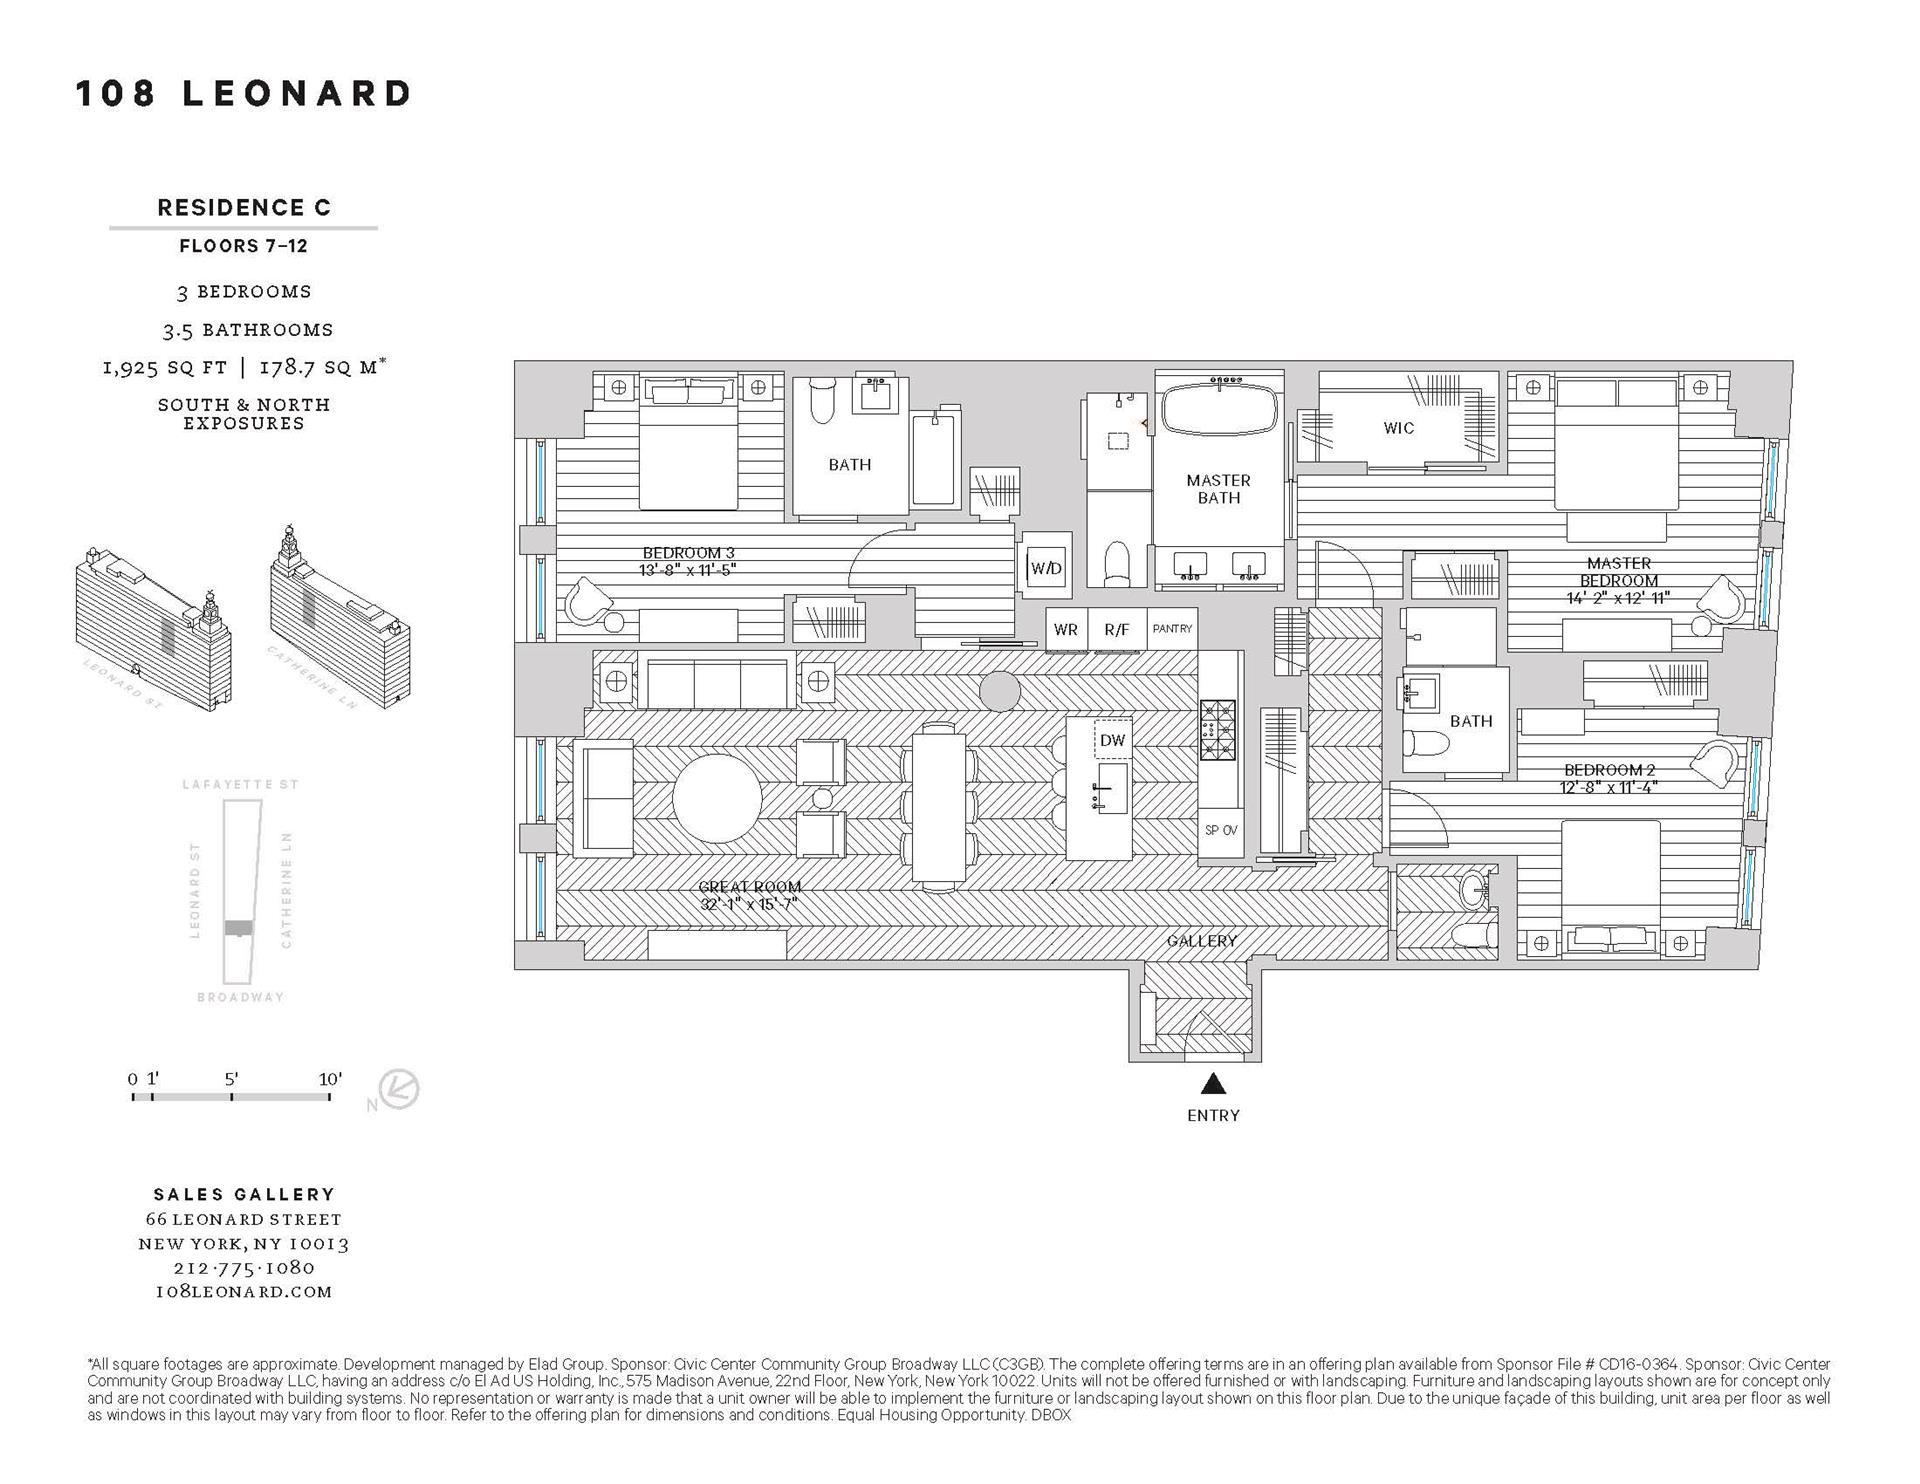 Floor plan of 108 Leonard St, 7C - TriBeCa, New York